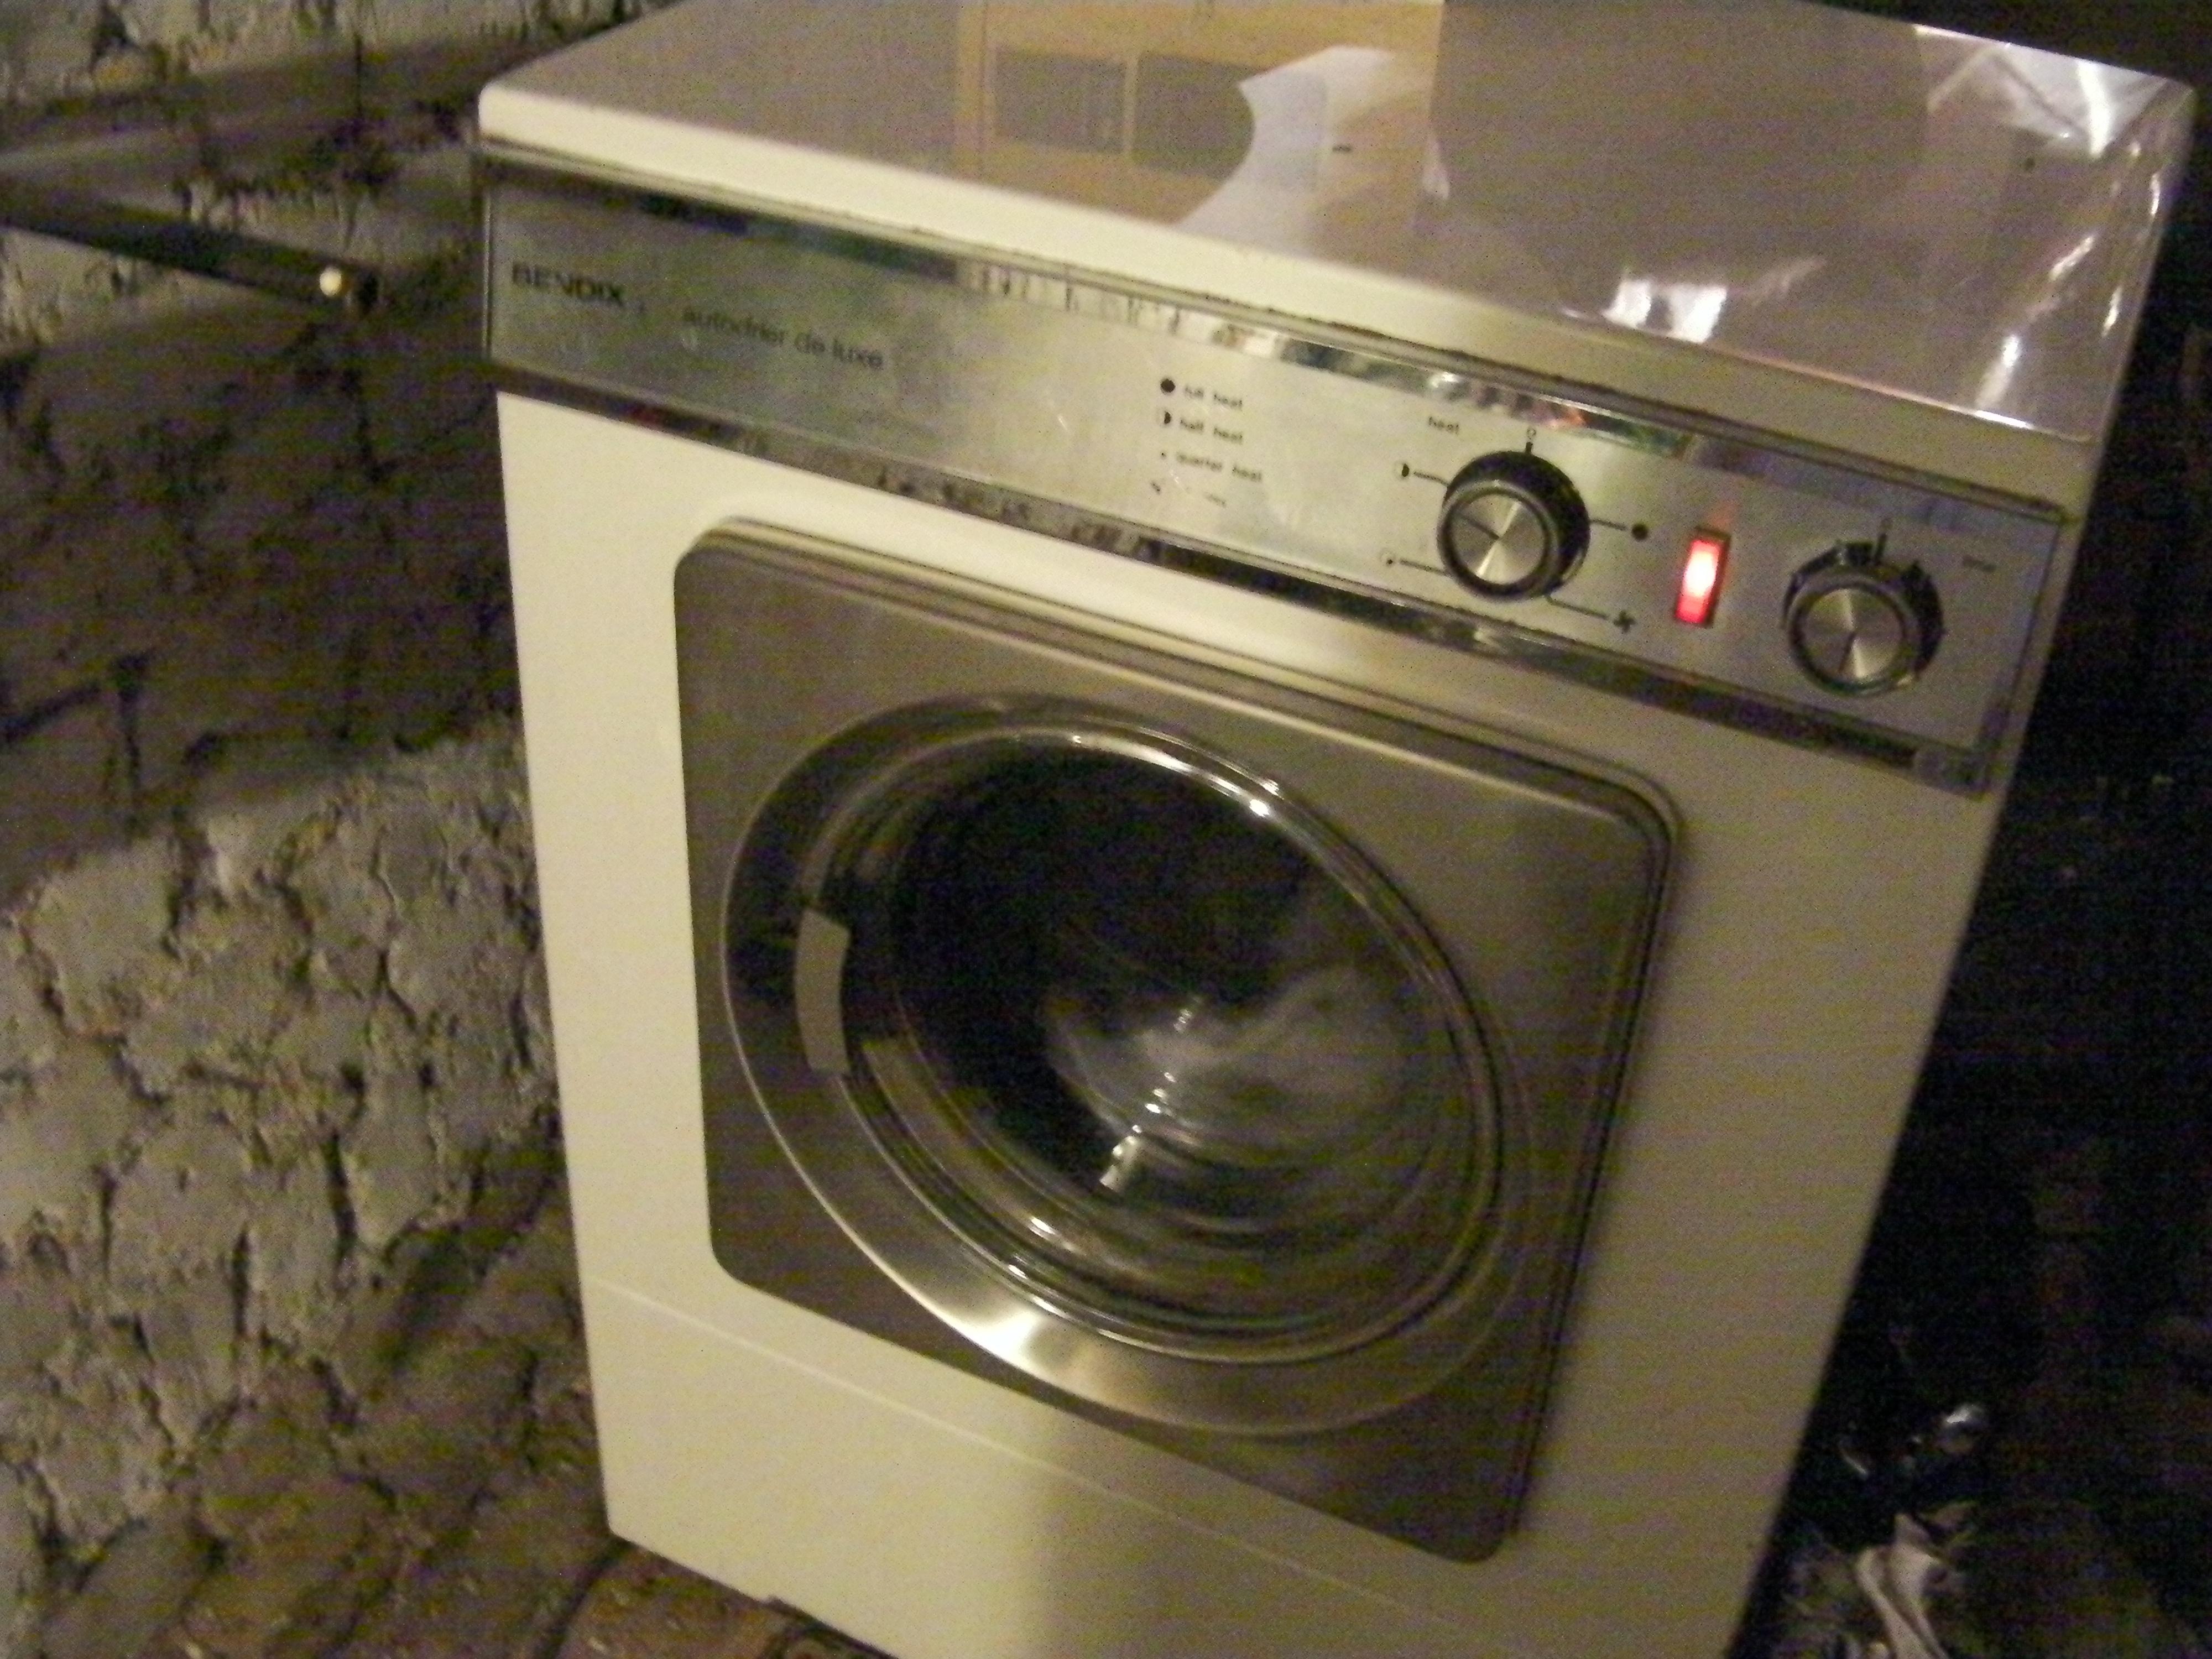 bosch exxcel dishwasher parts diagram car audio system wiring 1100 washing machine manual 2019 ebook library